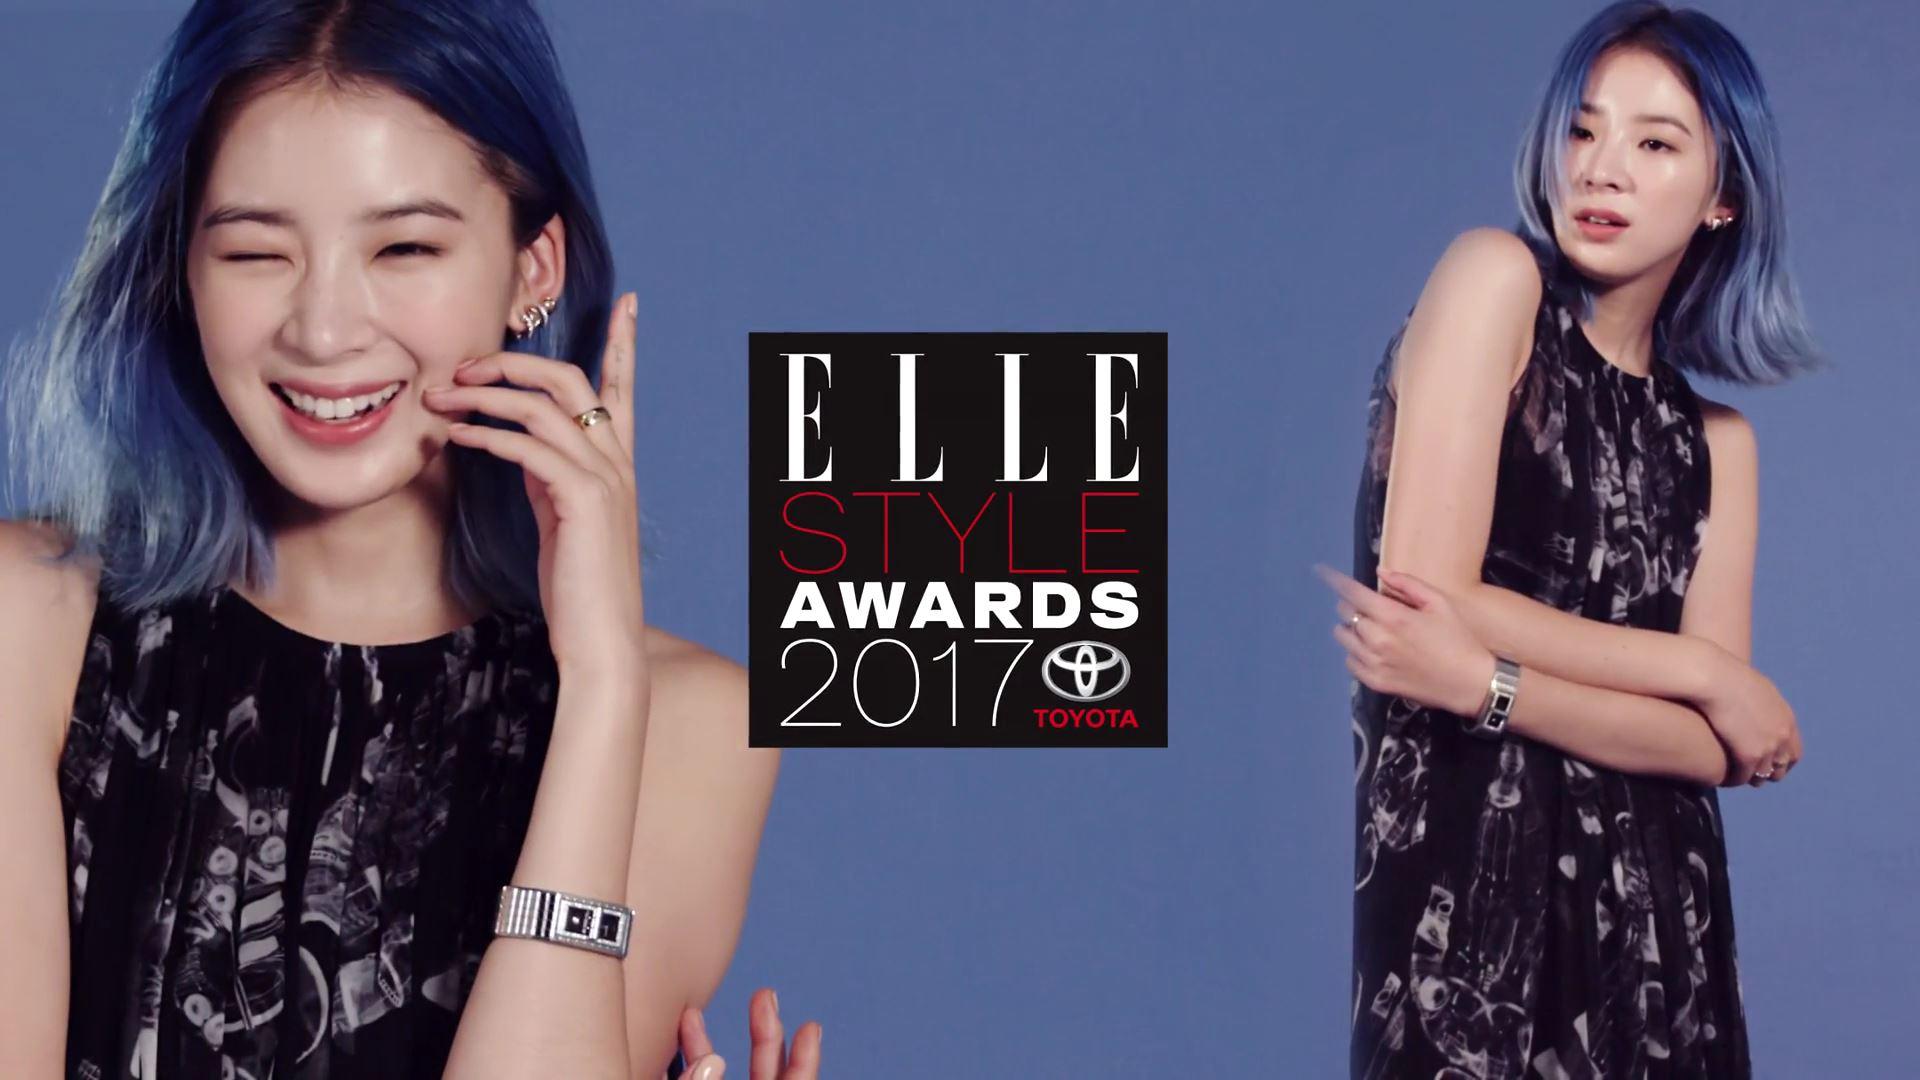 ELLE STYLE AWARDS KOREA 2017 -아이린